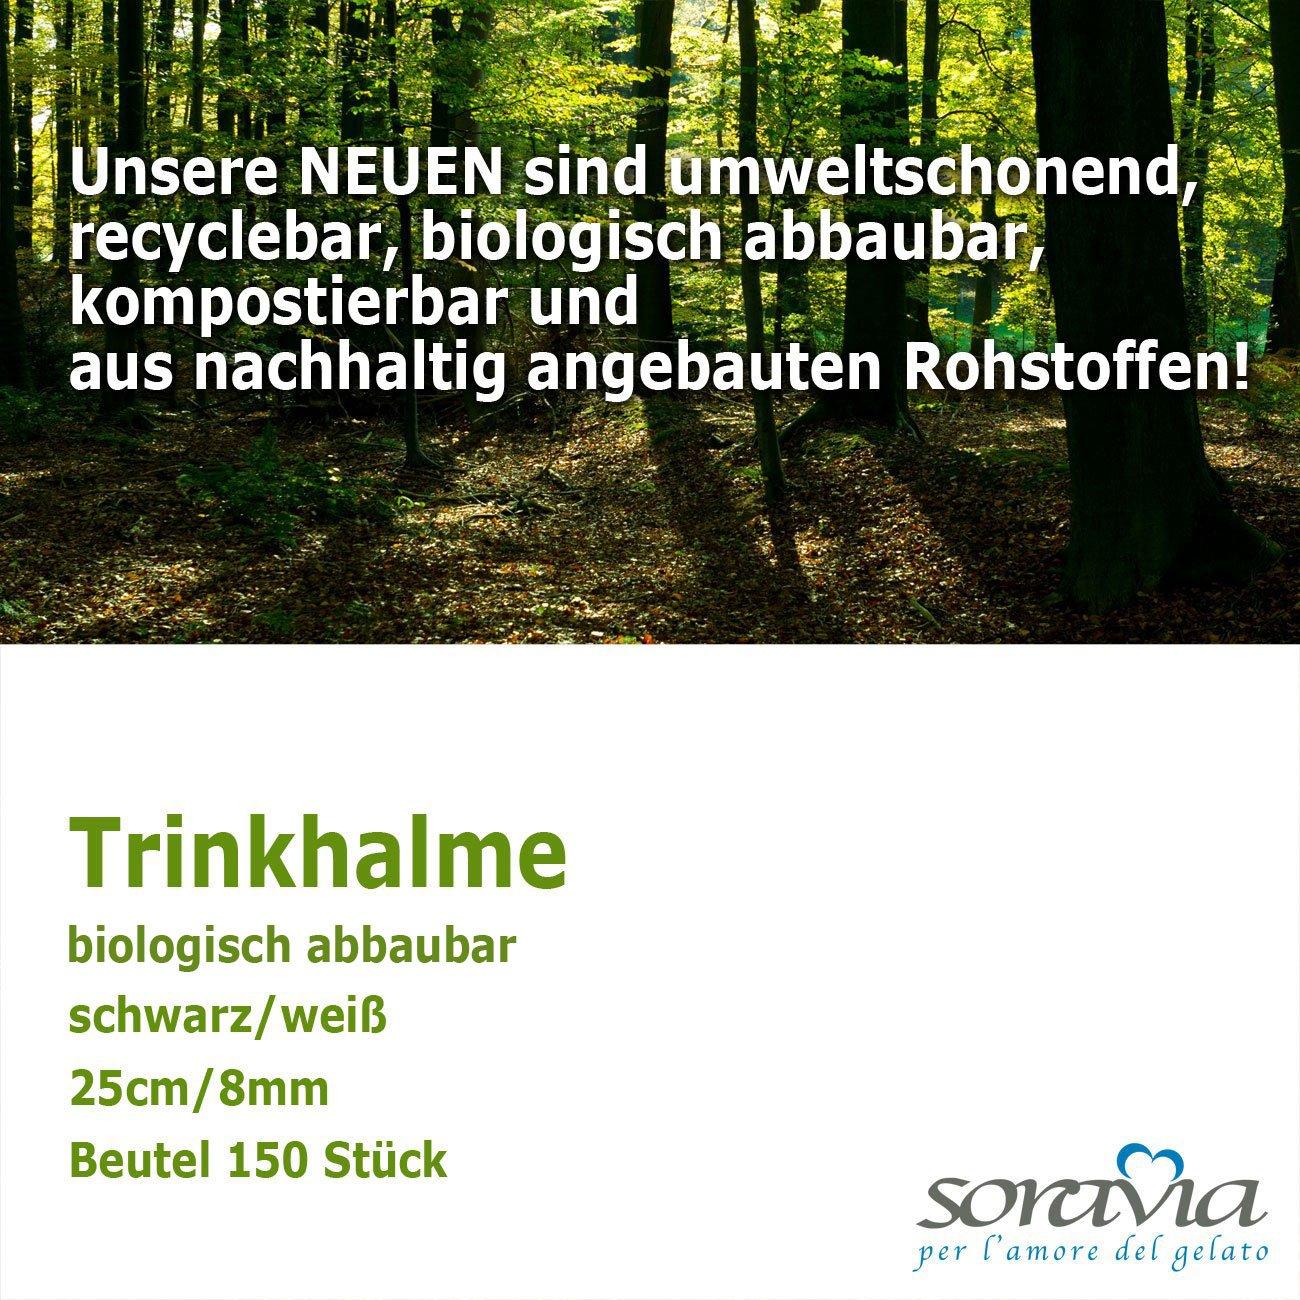 biodegradable Straws big - 25 cm / 8 mm - paket = 150 pieces